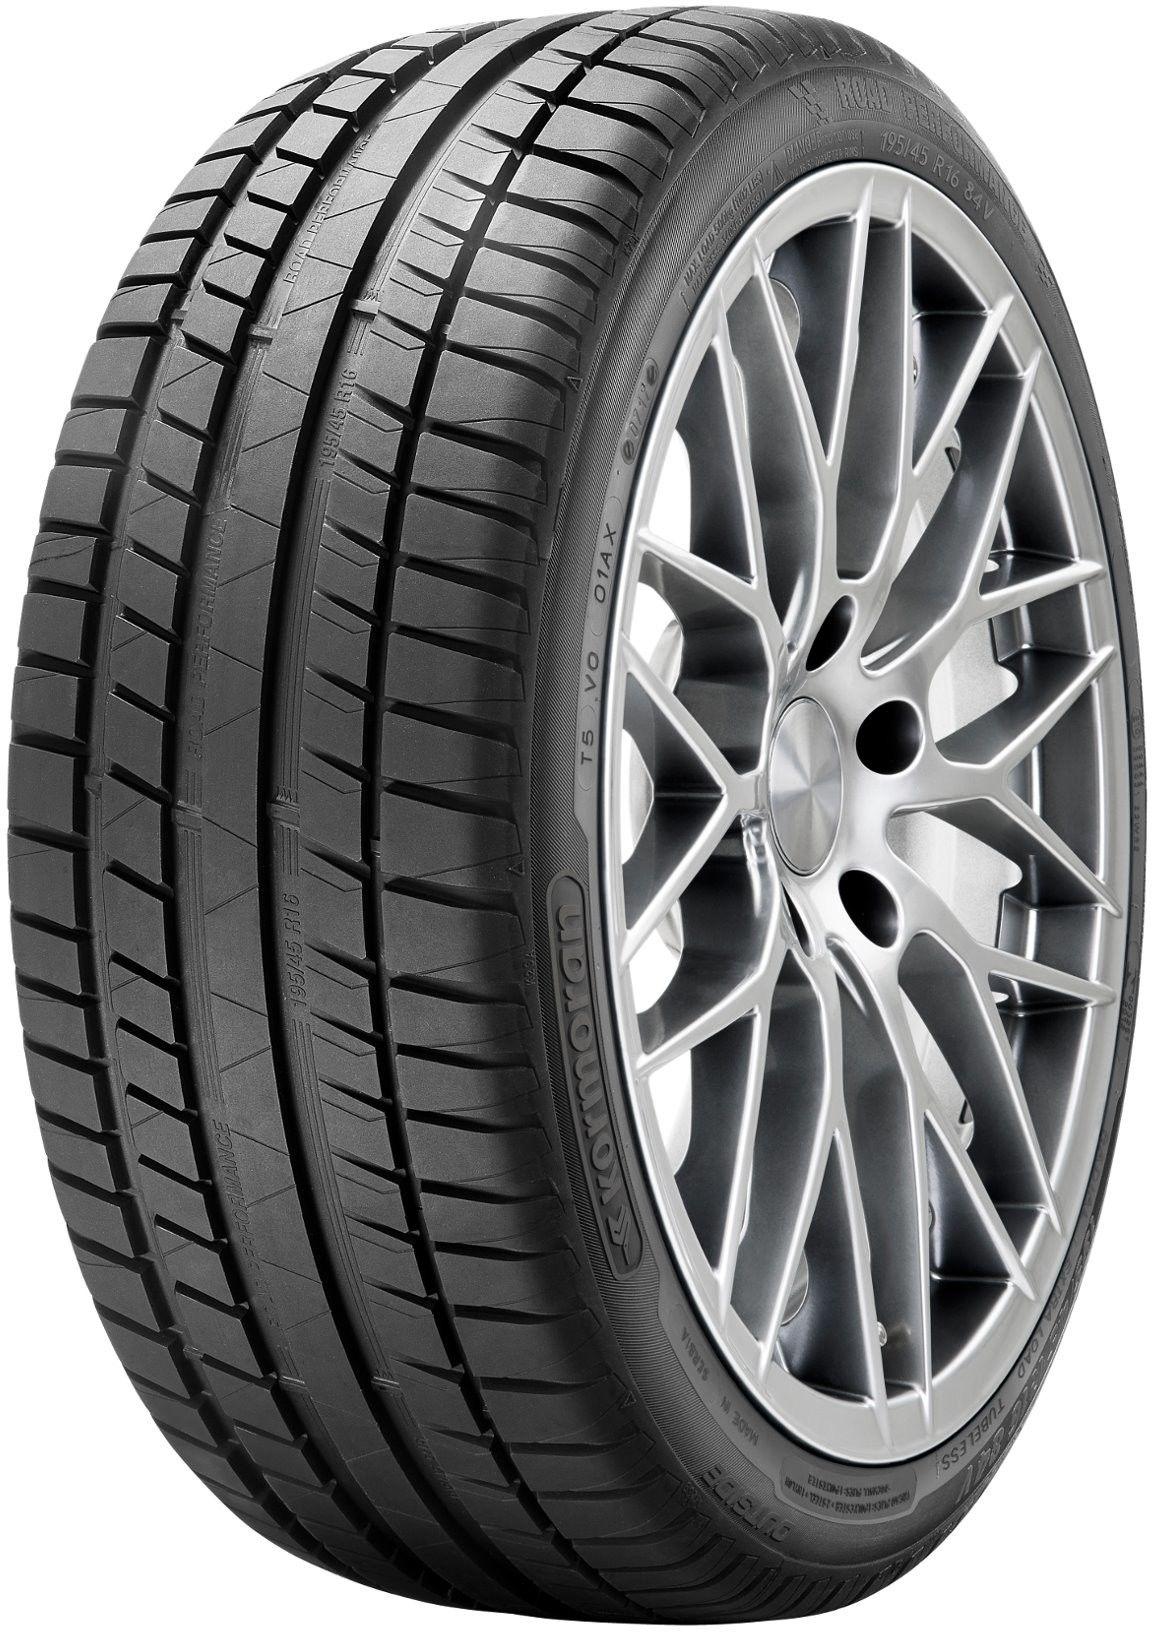 Kormoran Road Performance 225/55 R16 99 W